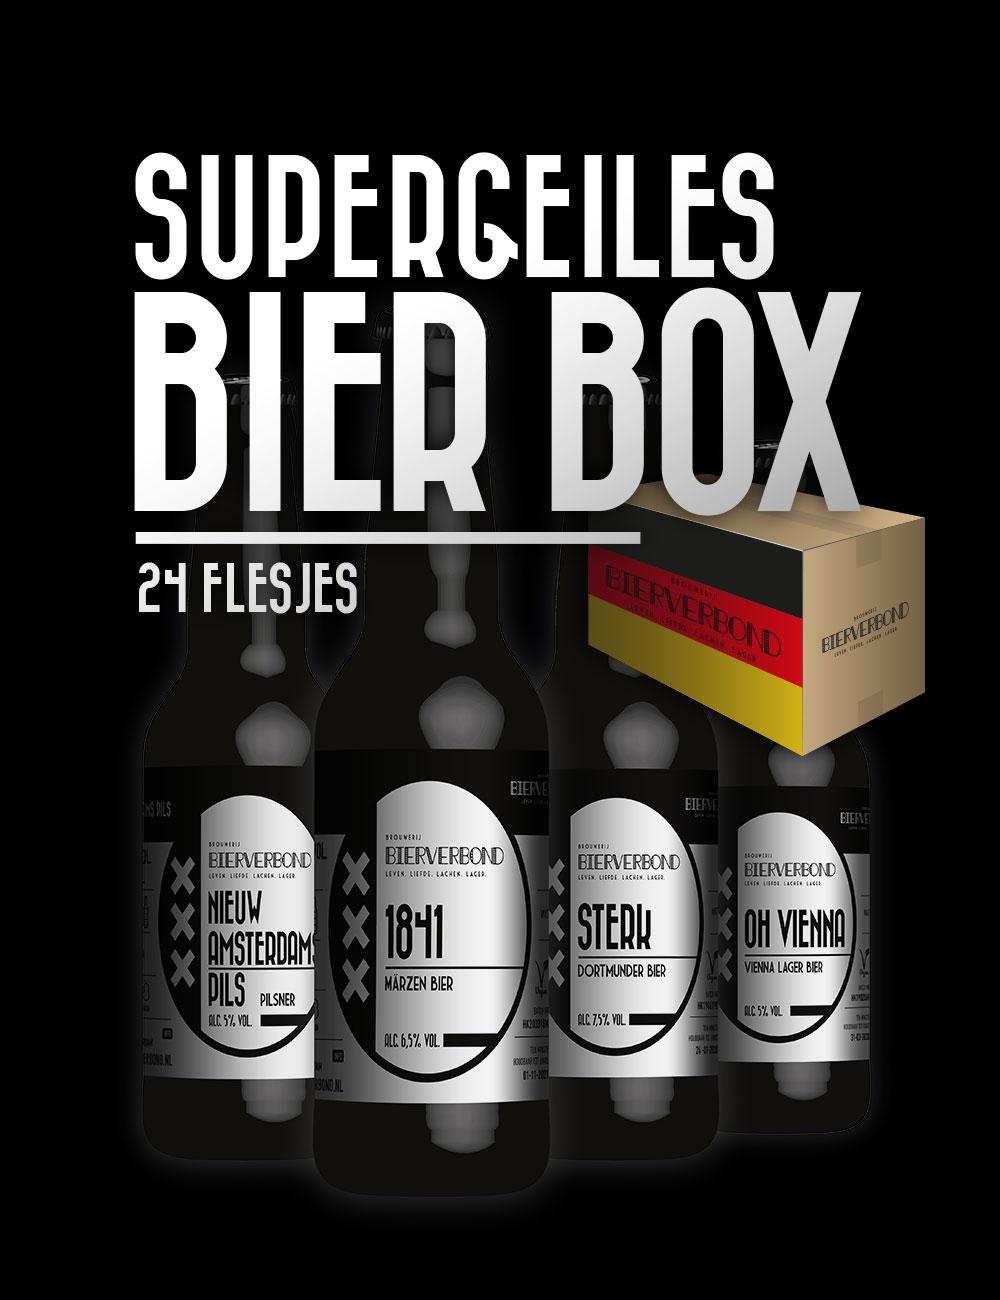 Supergeiles Bier Box (gratis verzonden)